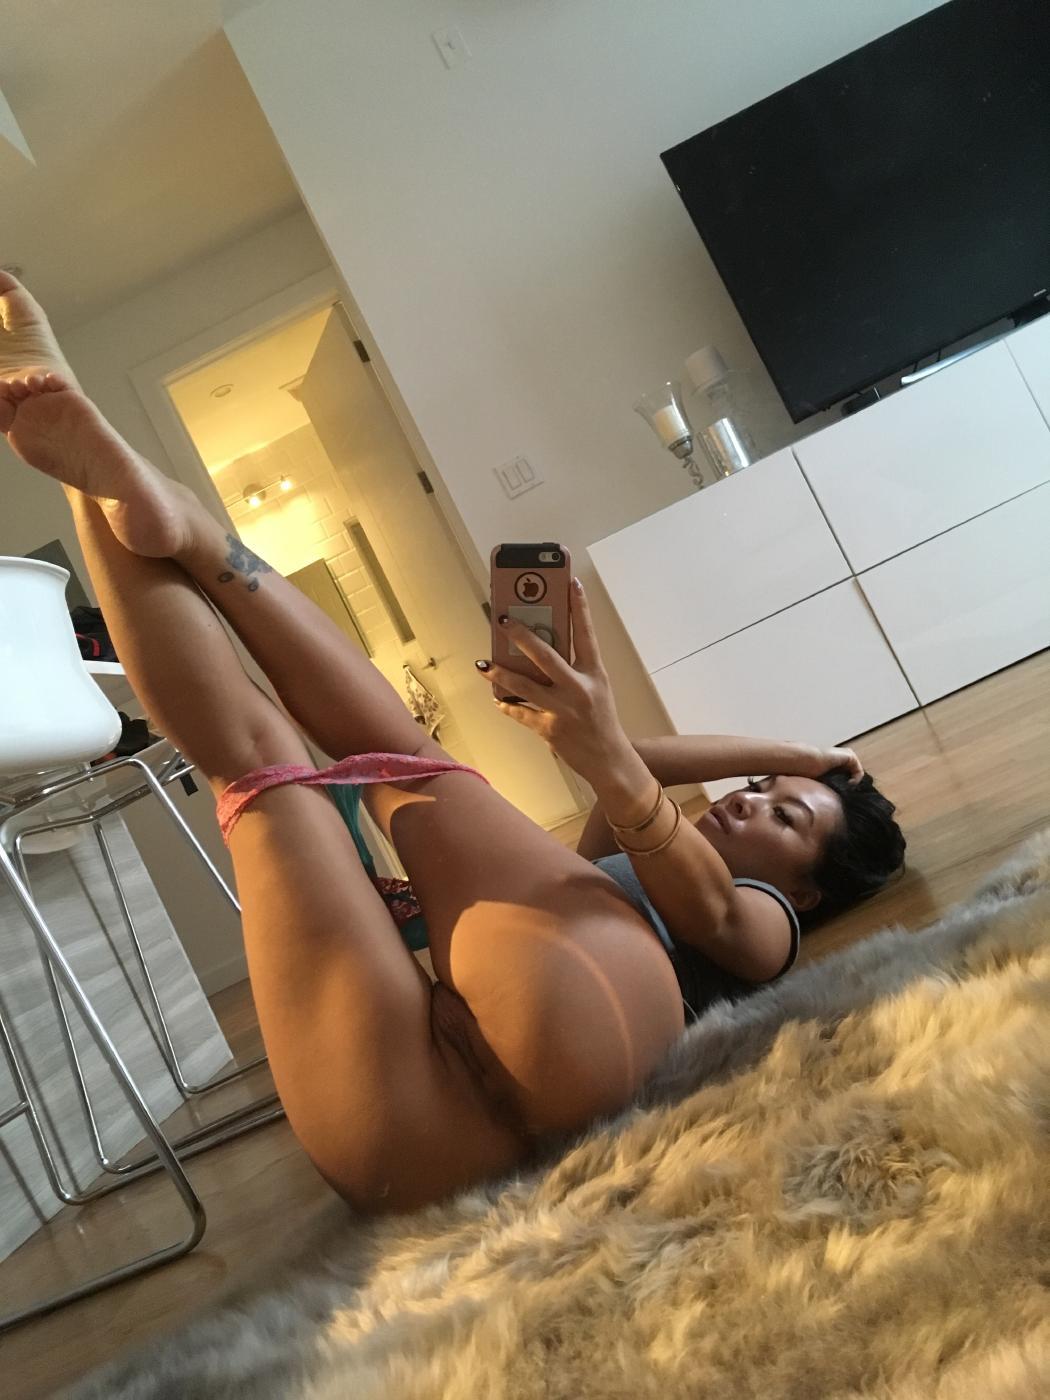 Asa Akira Nude Strip Selfies Onlyfans Set Leaked Ocoedb